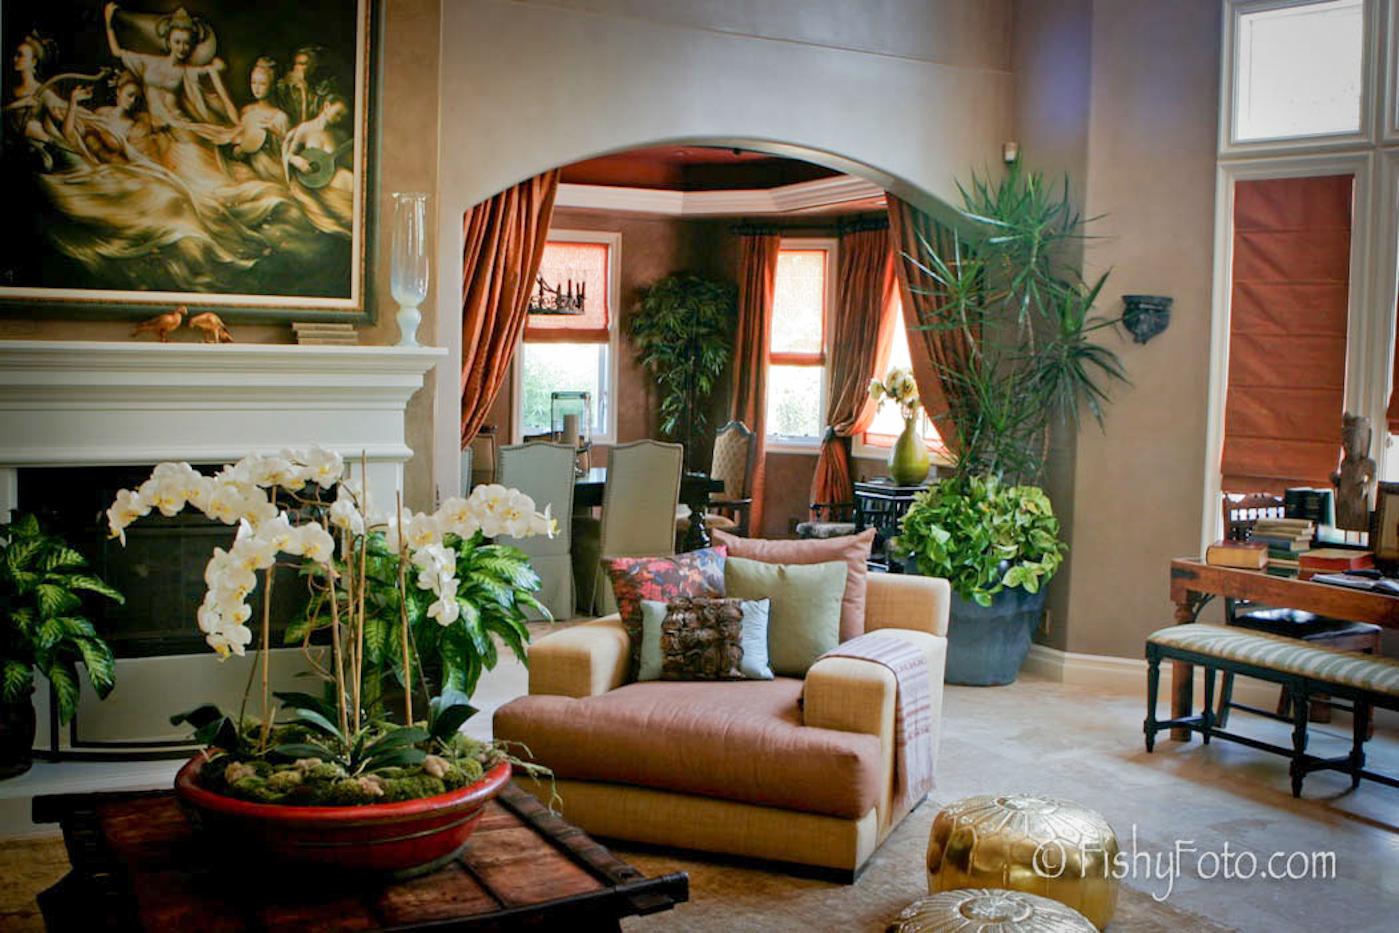 Jaime Pressly's indian inspired living room.  #FishyFoto